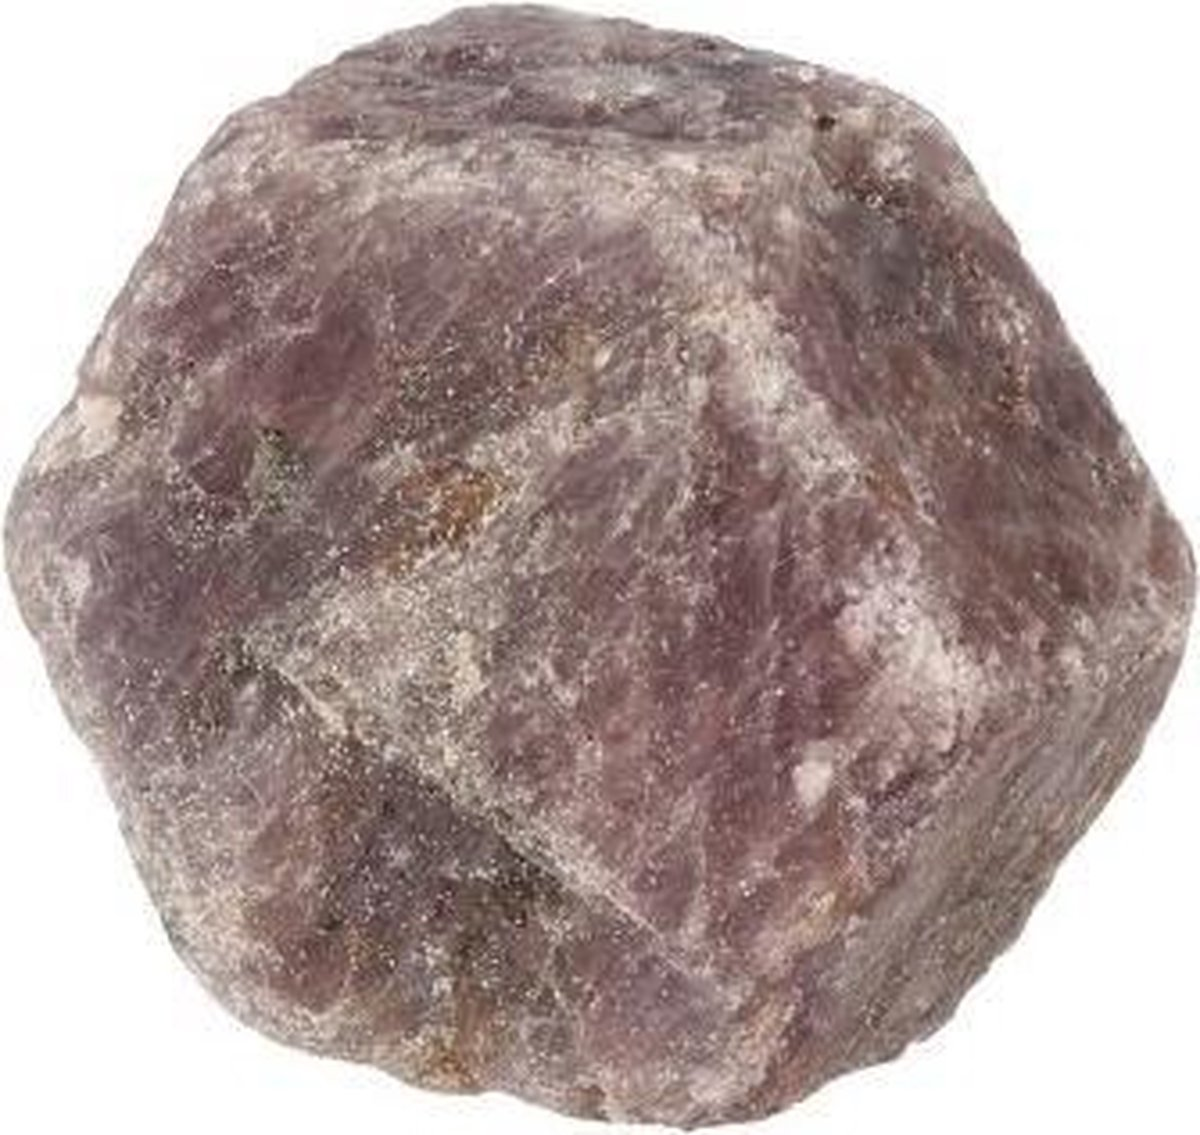 Stukje Robijn Kristal (15 - 30 mm)